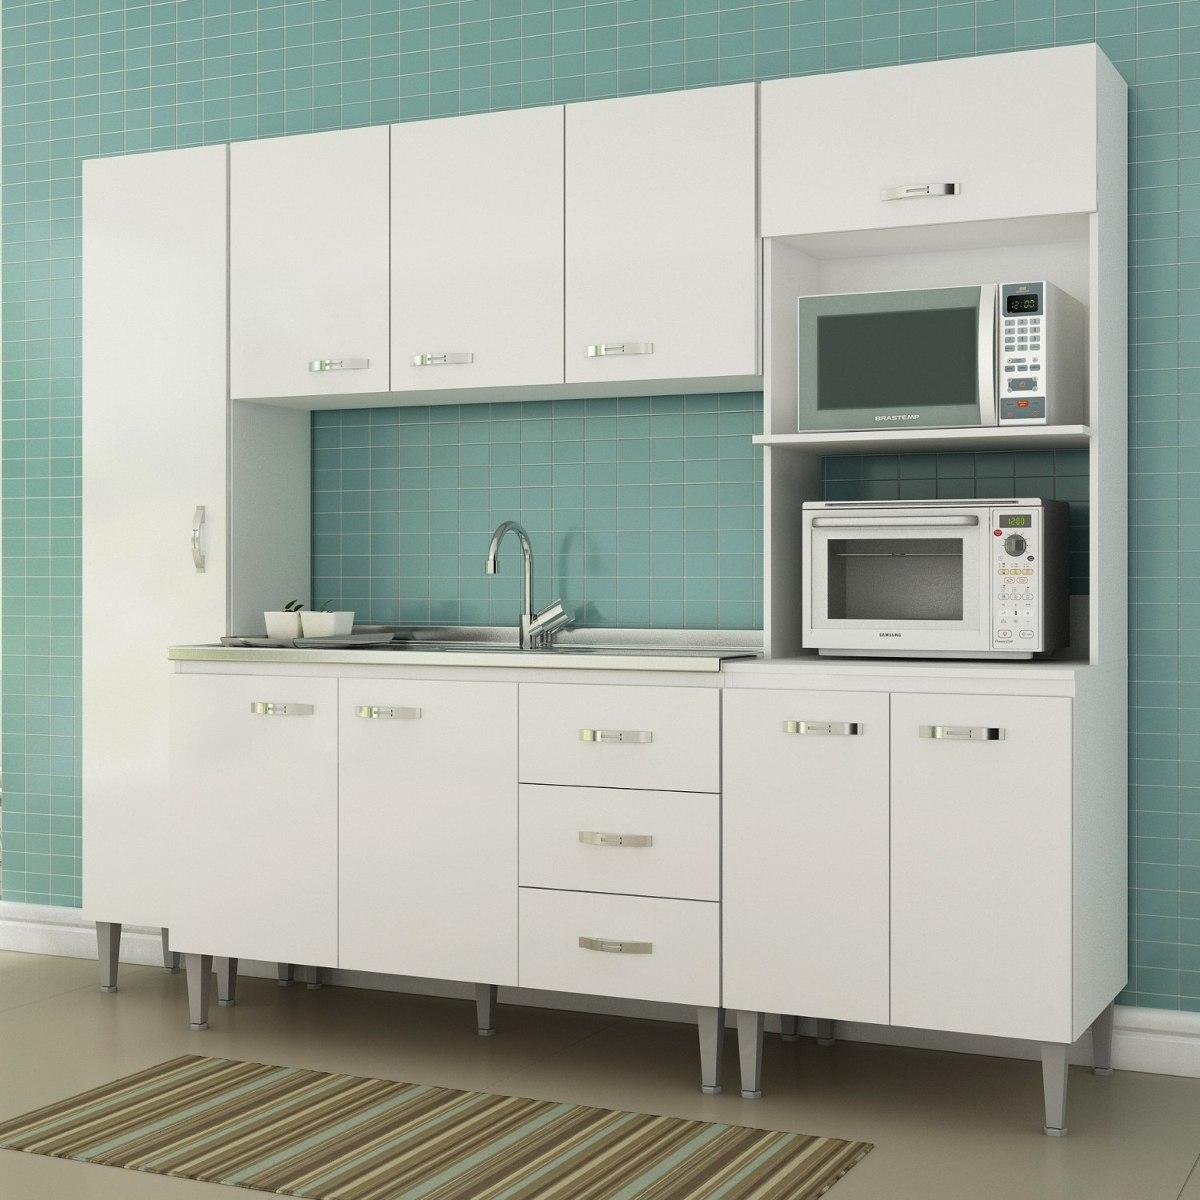 Cozinha Completa 4 Pe As Master Siena M Veis Branco Jiwt R 700 70